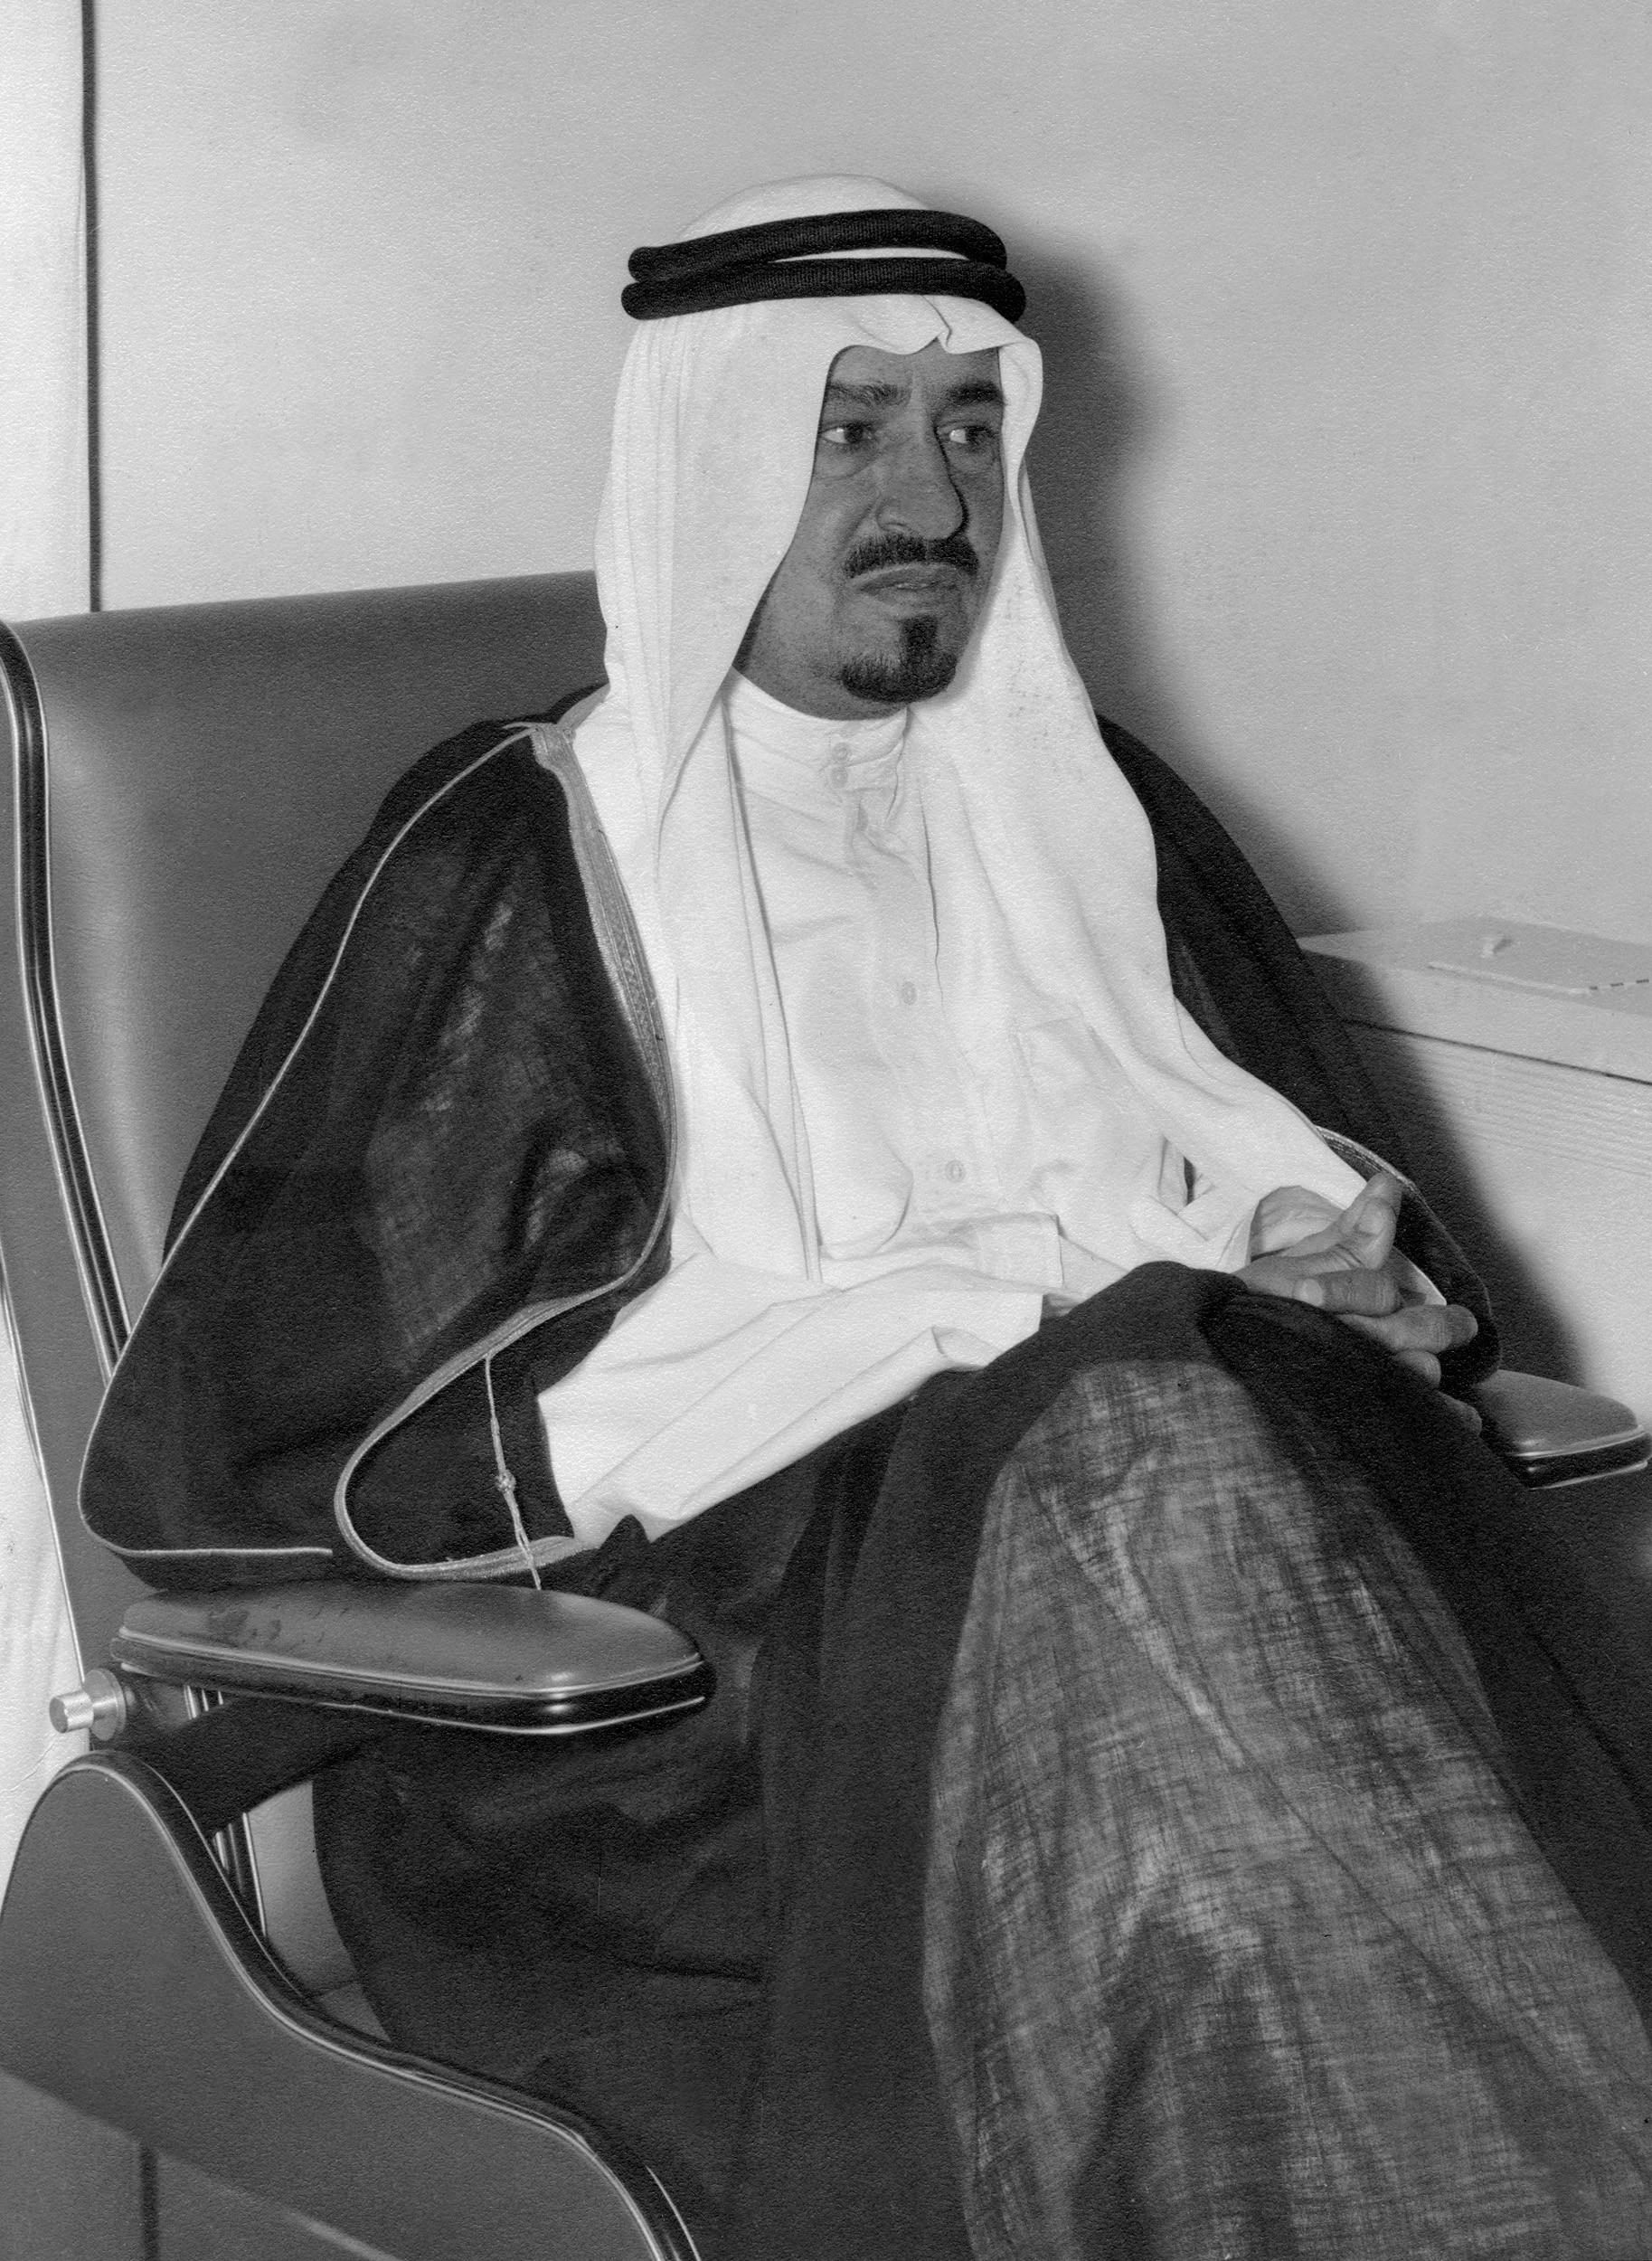 Mohammed Ibn al-Saud